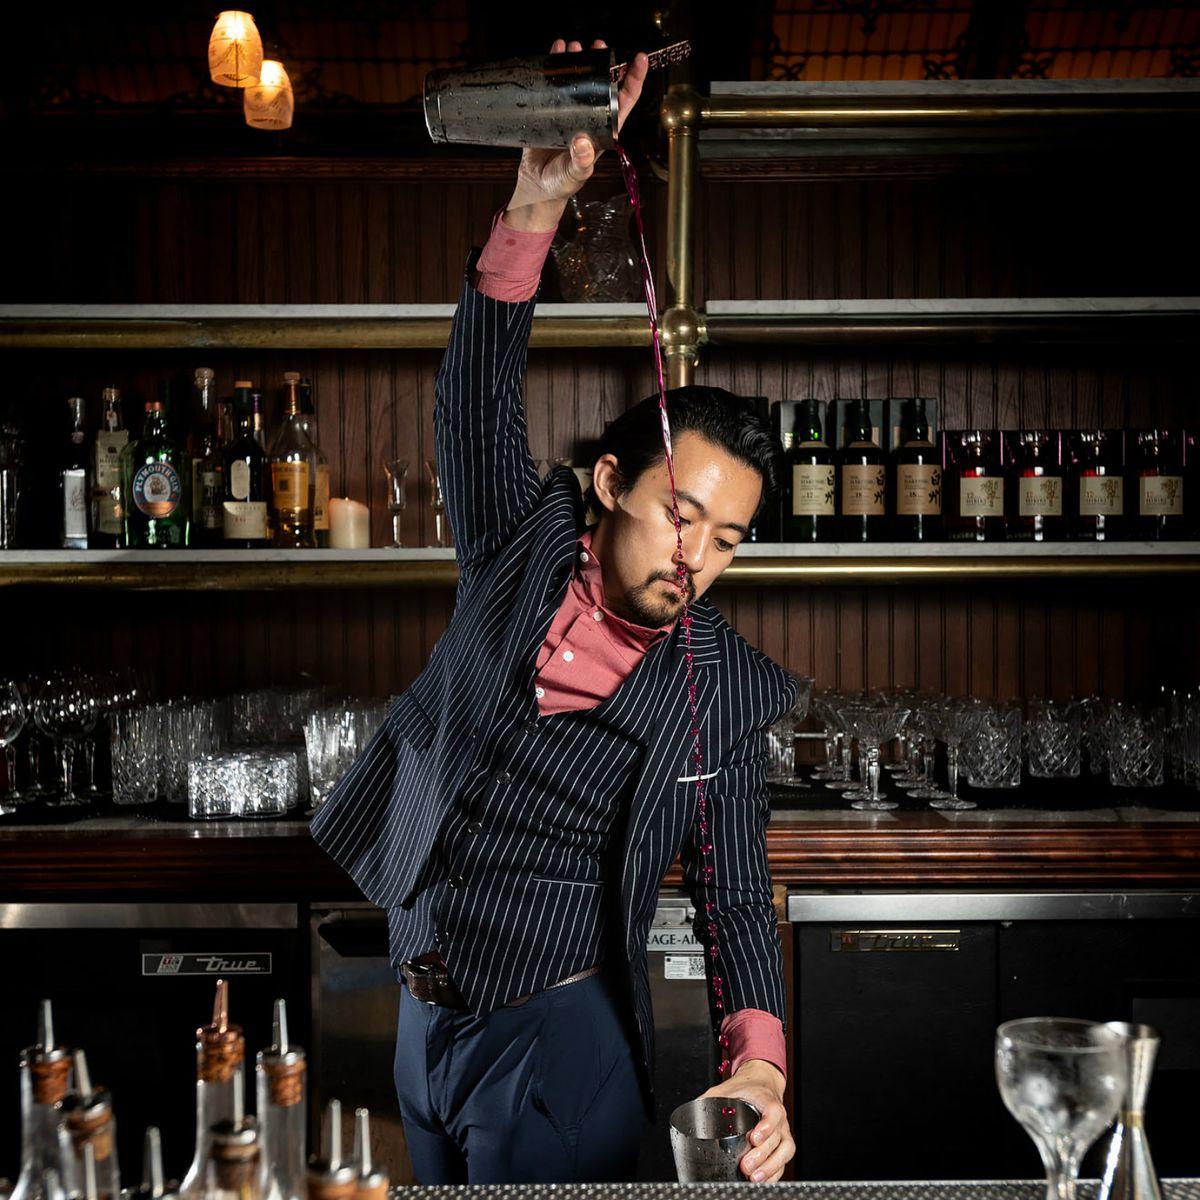 Bartender at The Wolves in LA